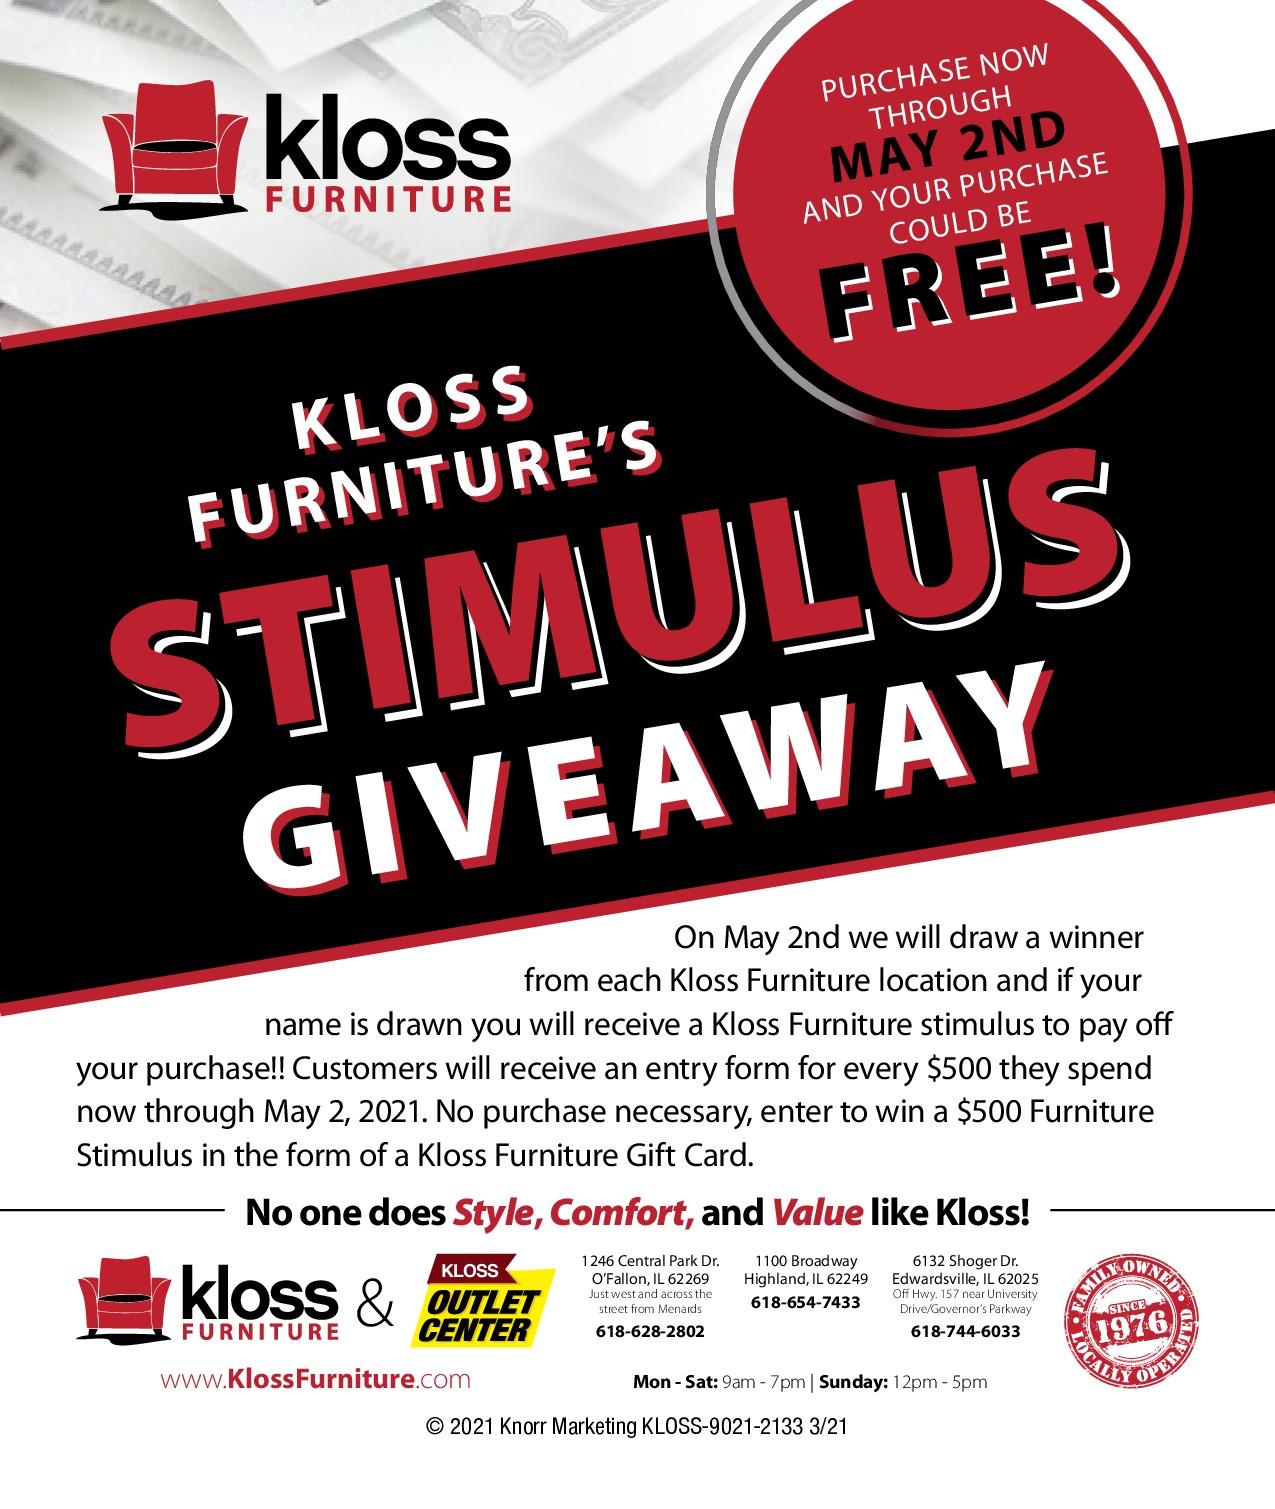 KLOSS-9021-2133-StimulusGiveaway-SpecialsPg